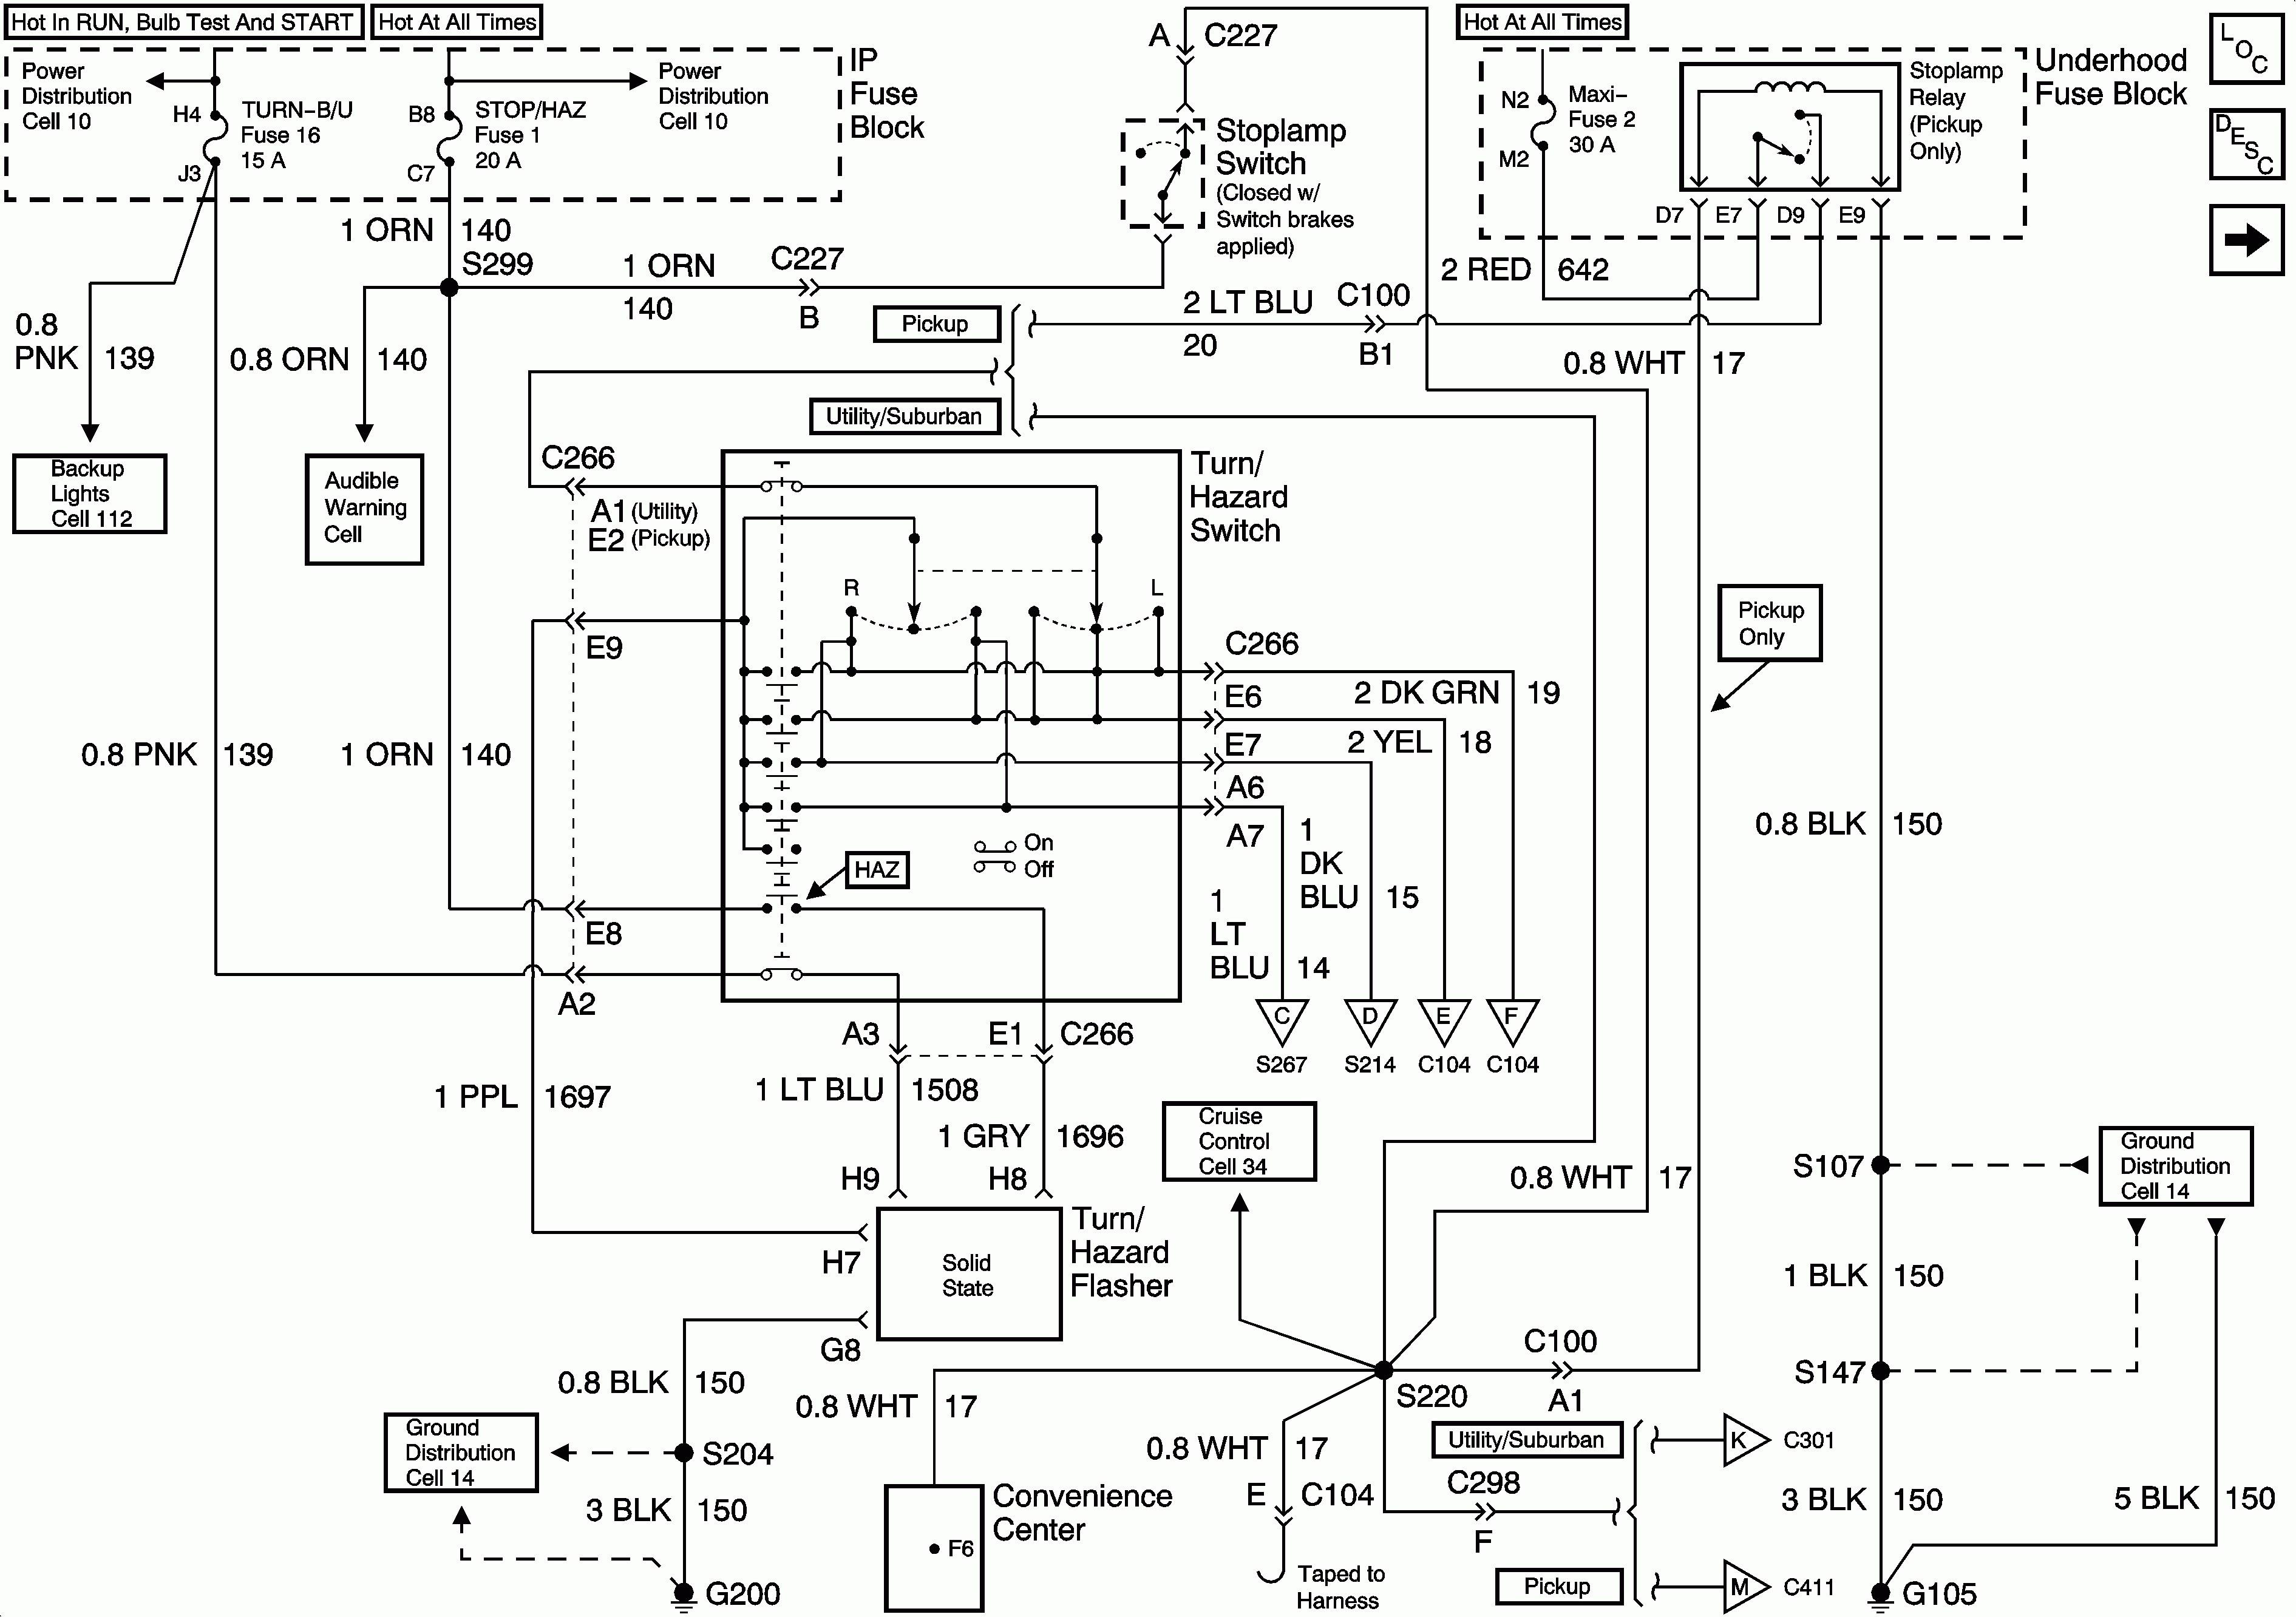 [DIAGRAM] Chevy Tahoe Engine Wiring Diagram FULL Version